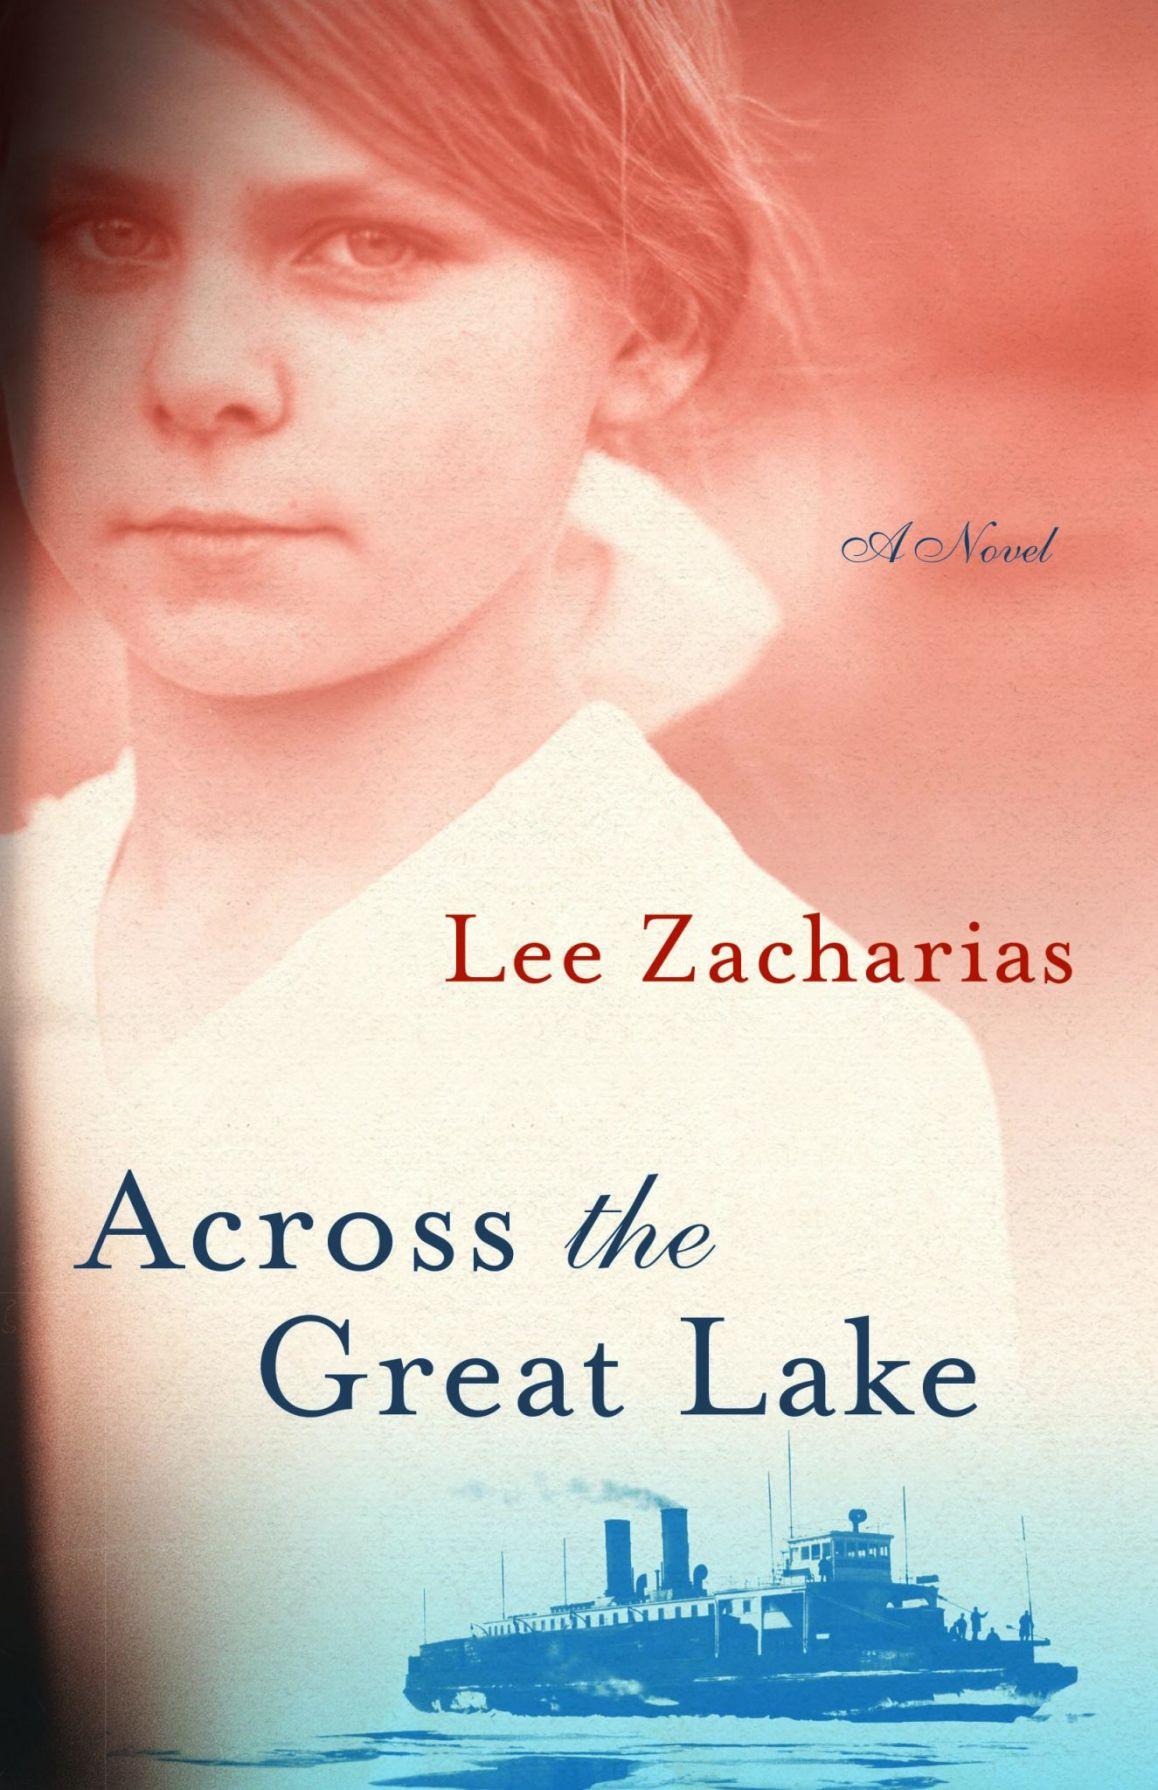 Zacharias.AcrossTheGreatLake.cover high res jpeg